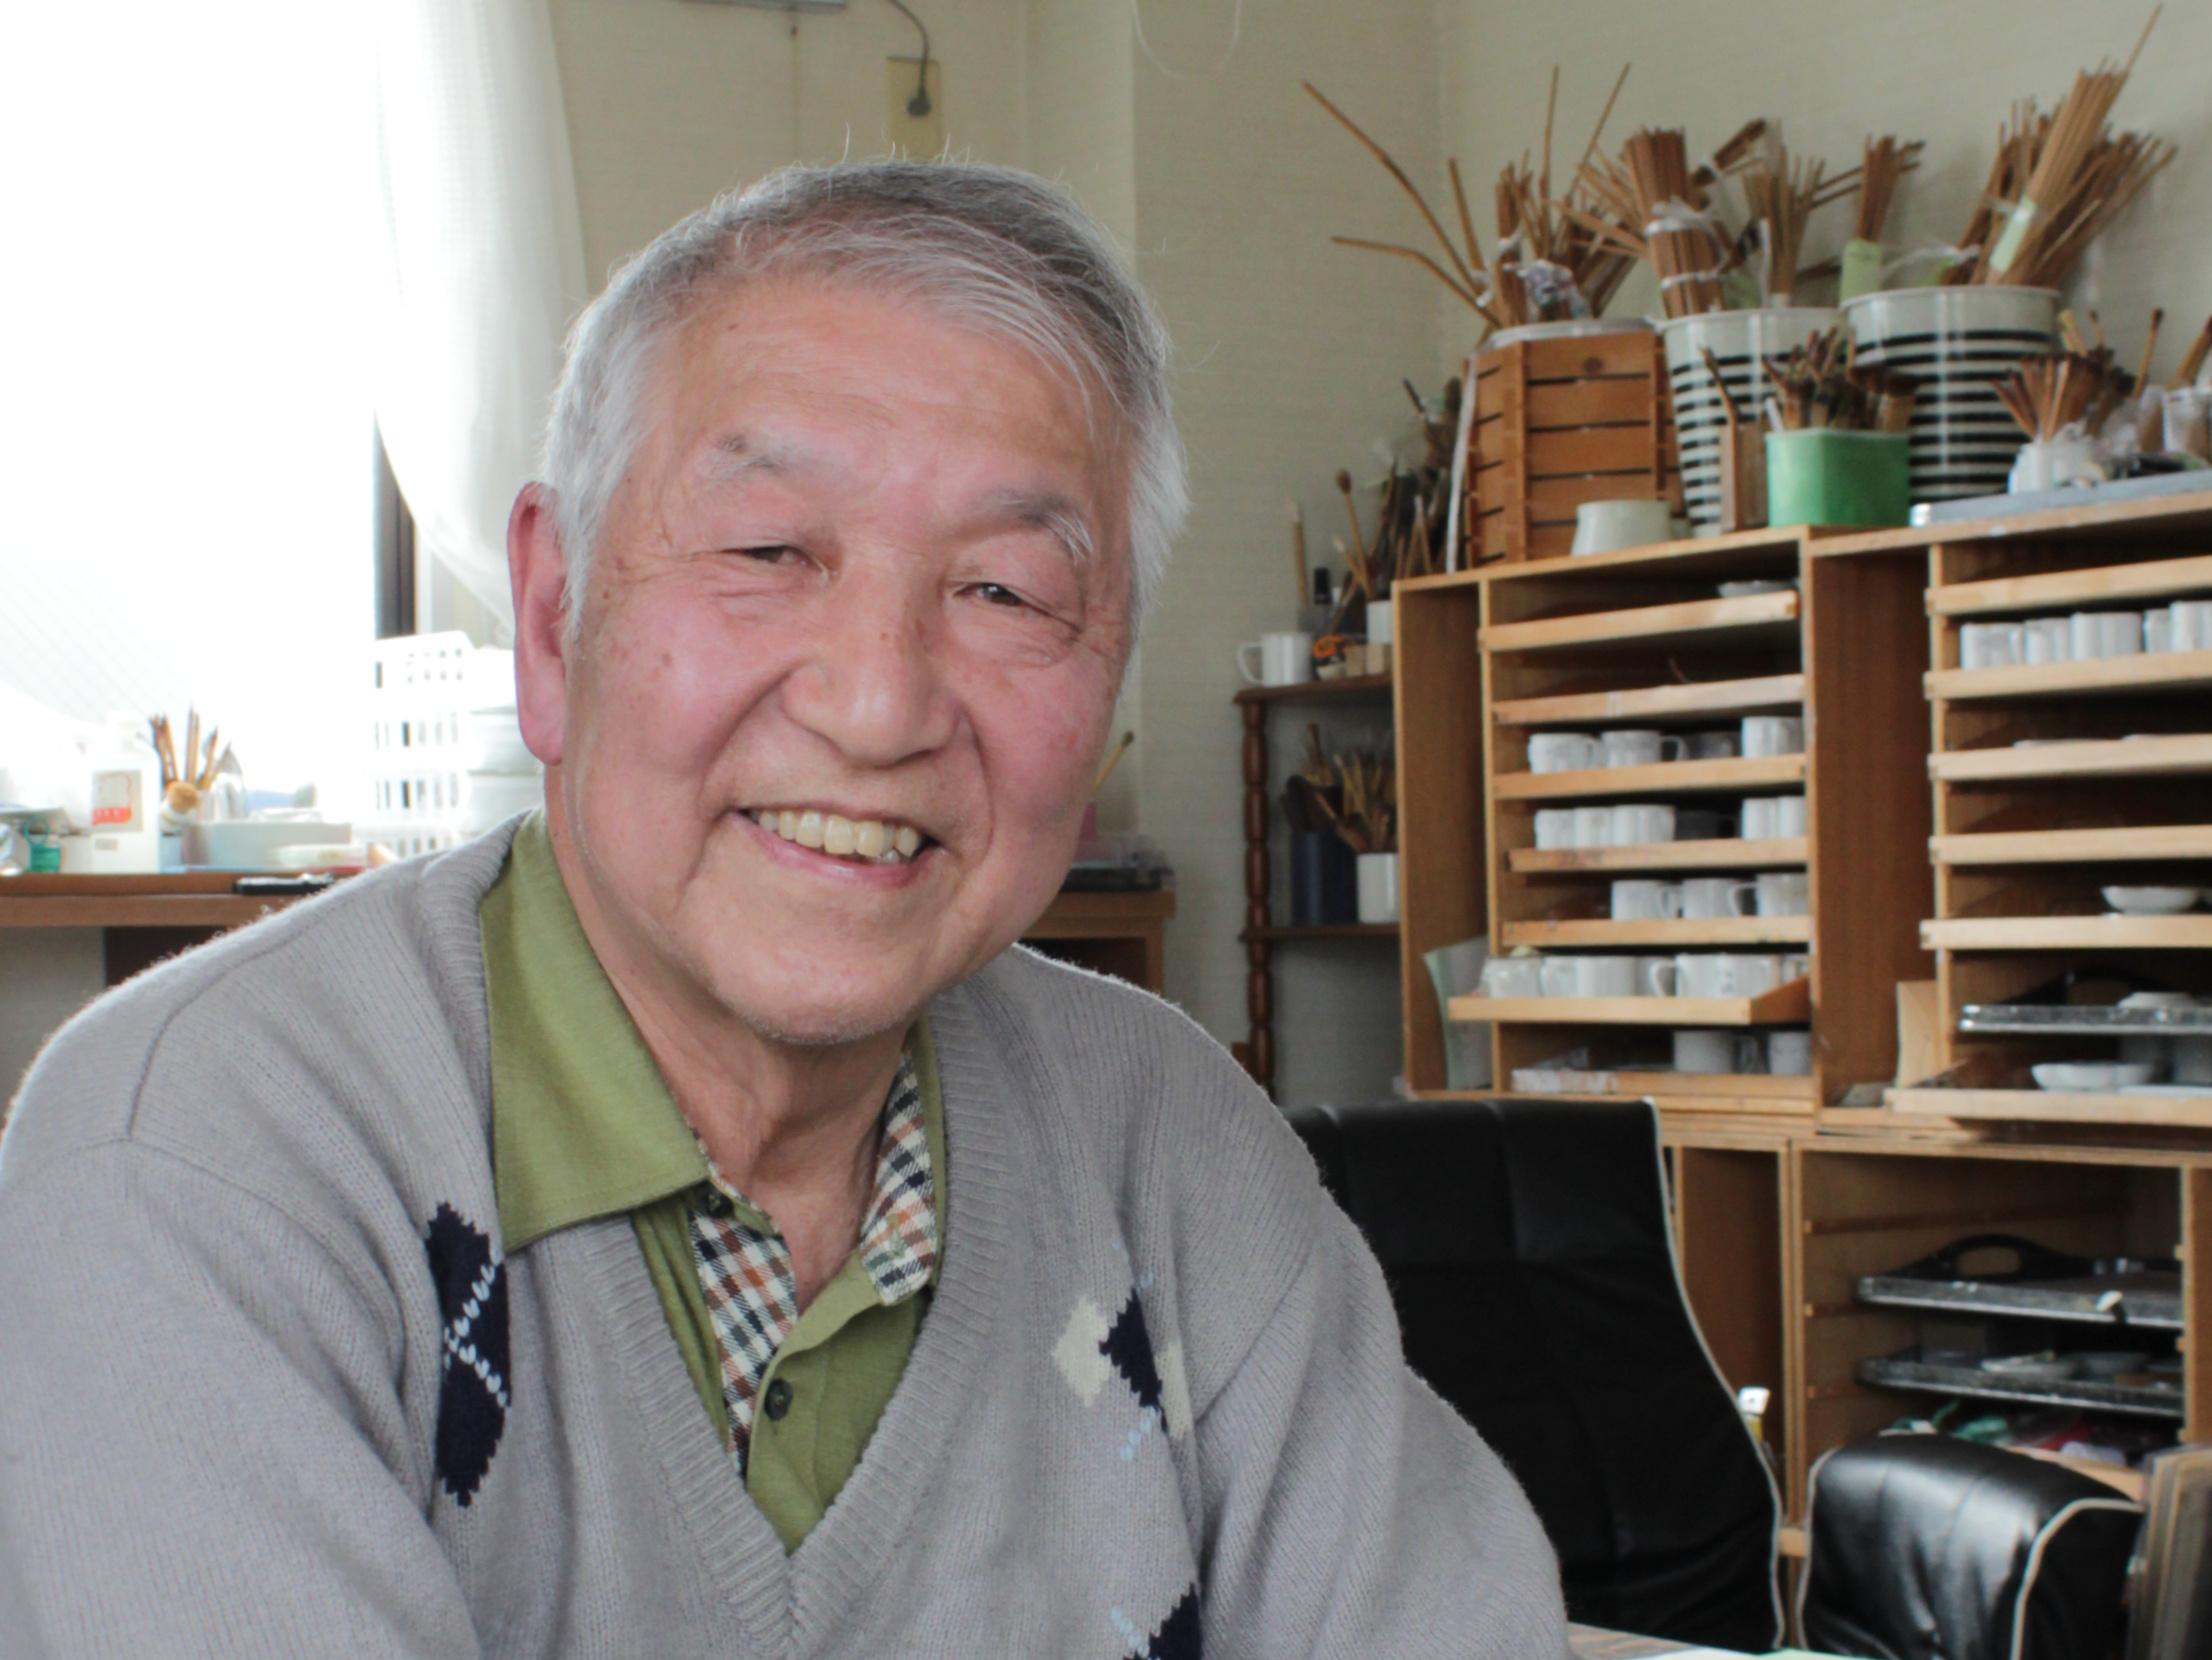 Ikkou Teranishi, master kimono artist at the Nagamachi Yuzenkan in Kanazawa